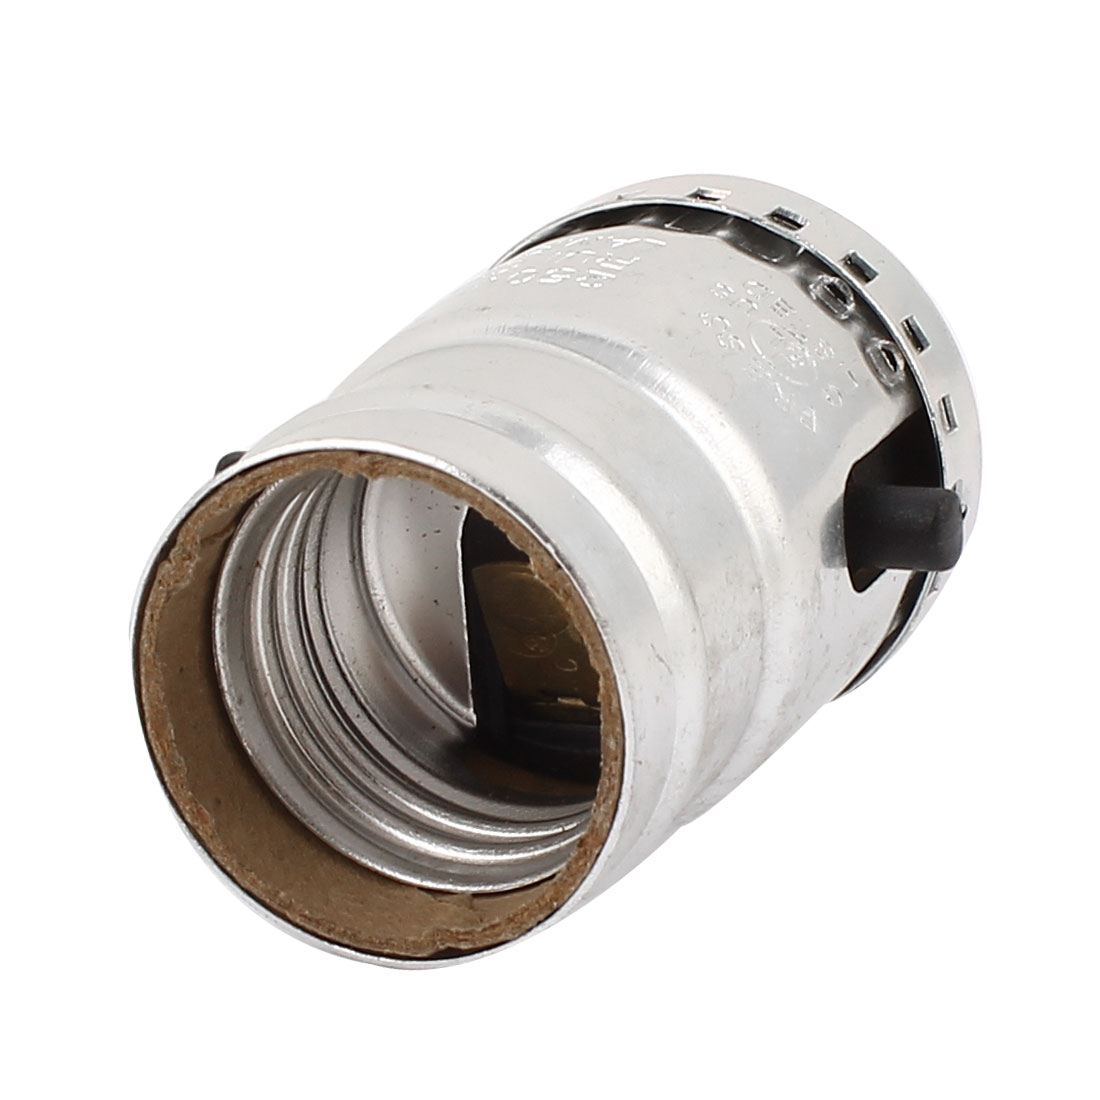 E26 Bulb Base Holder Light Screw Switch Lamp Socket Adapter Silver Tone